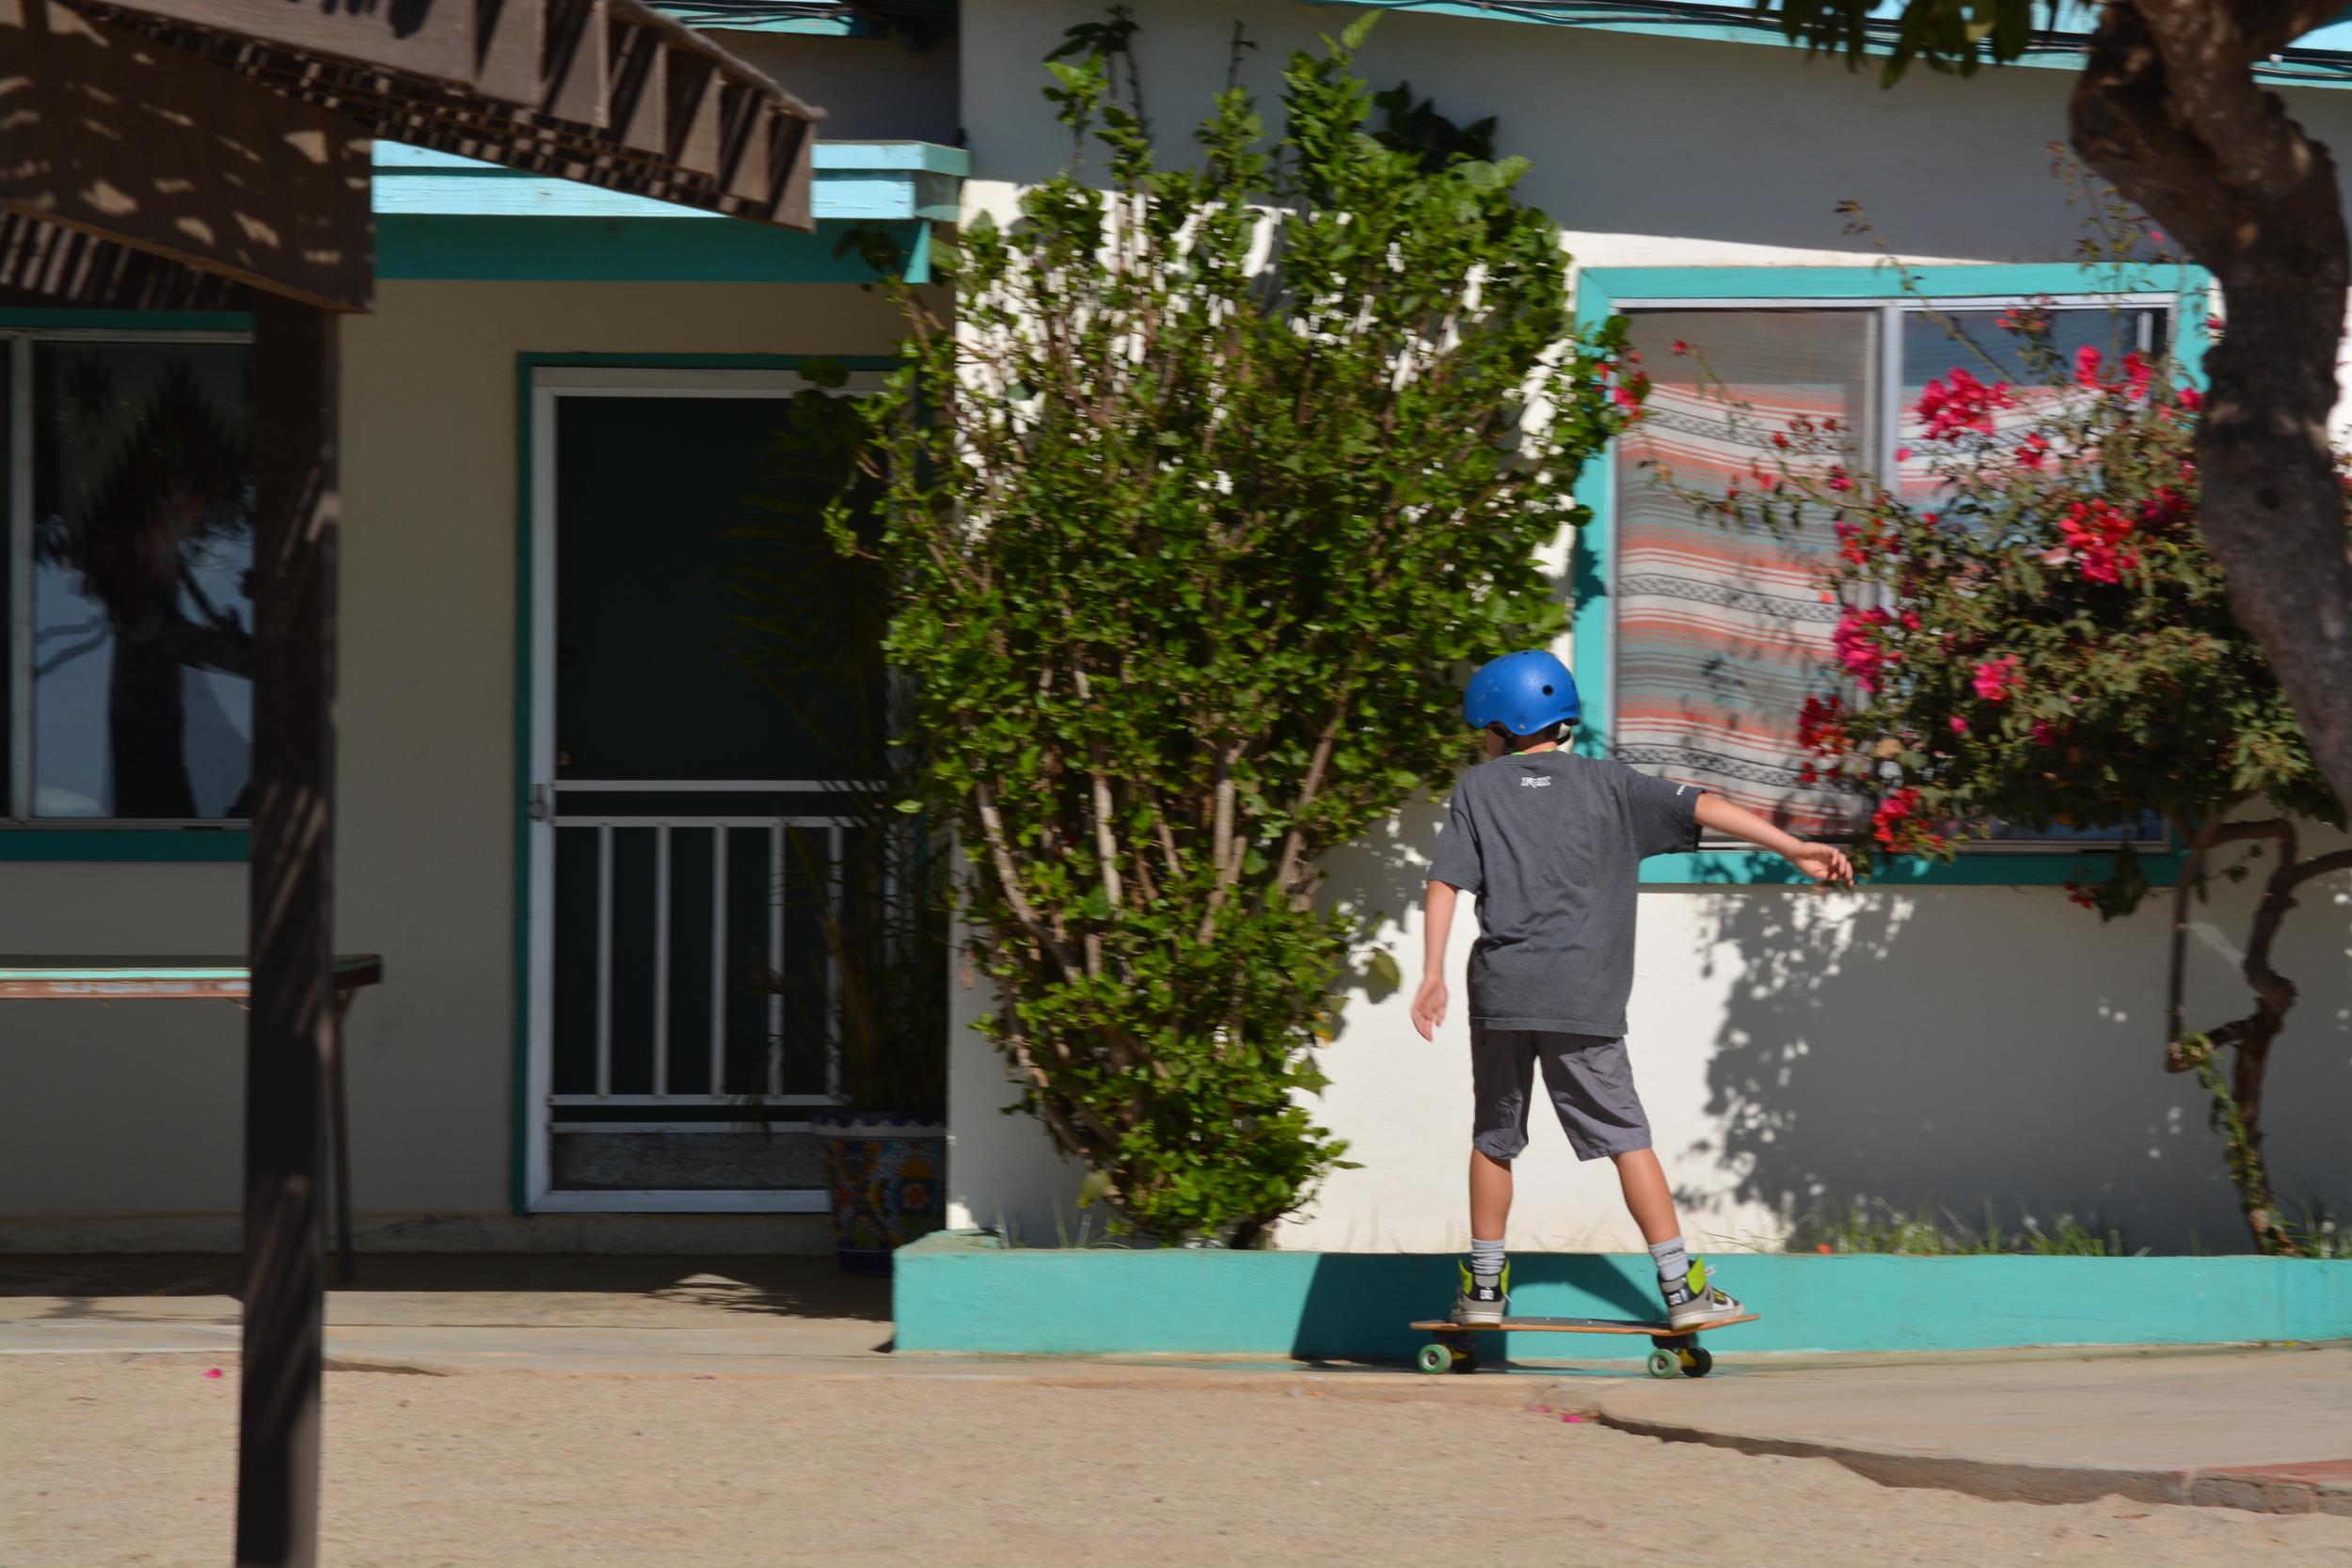 Baja California 10-5-13 Shipwrecks Surfing Adventure Ocean Experience Surf School San Diego (63).JPG